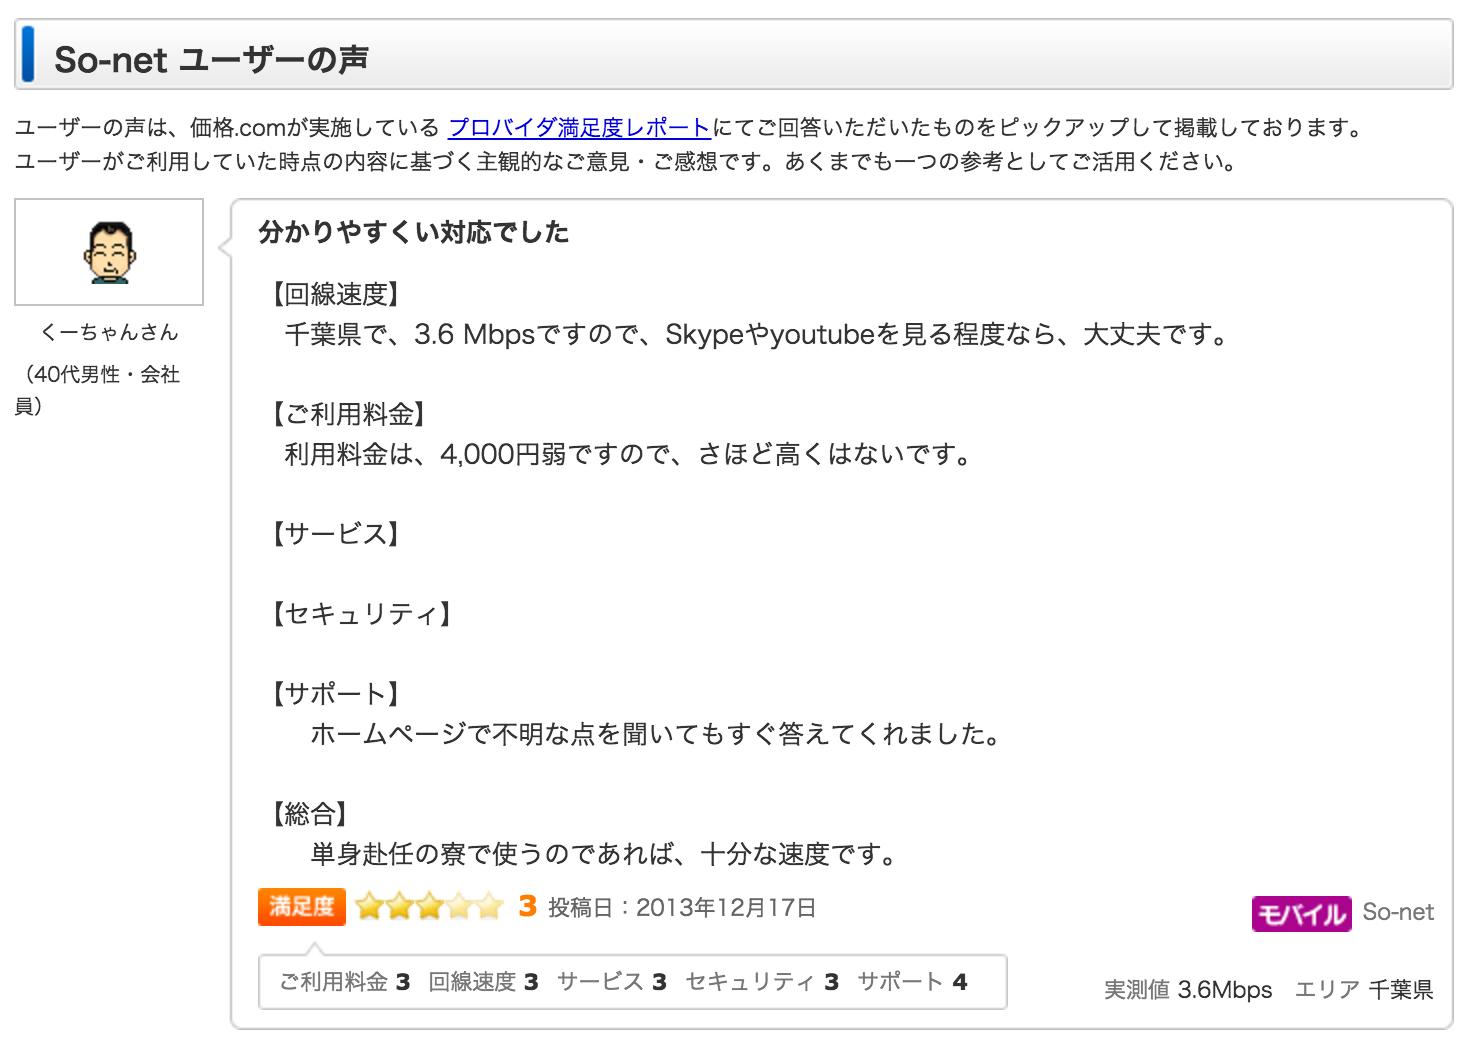 So-netモバイル_口コミ